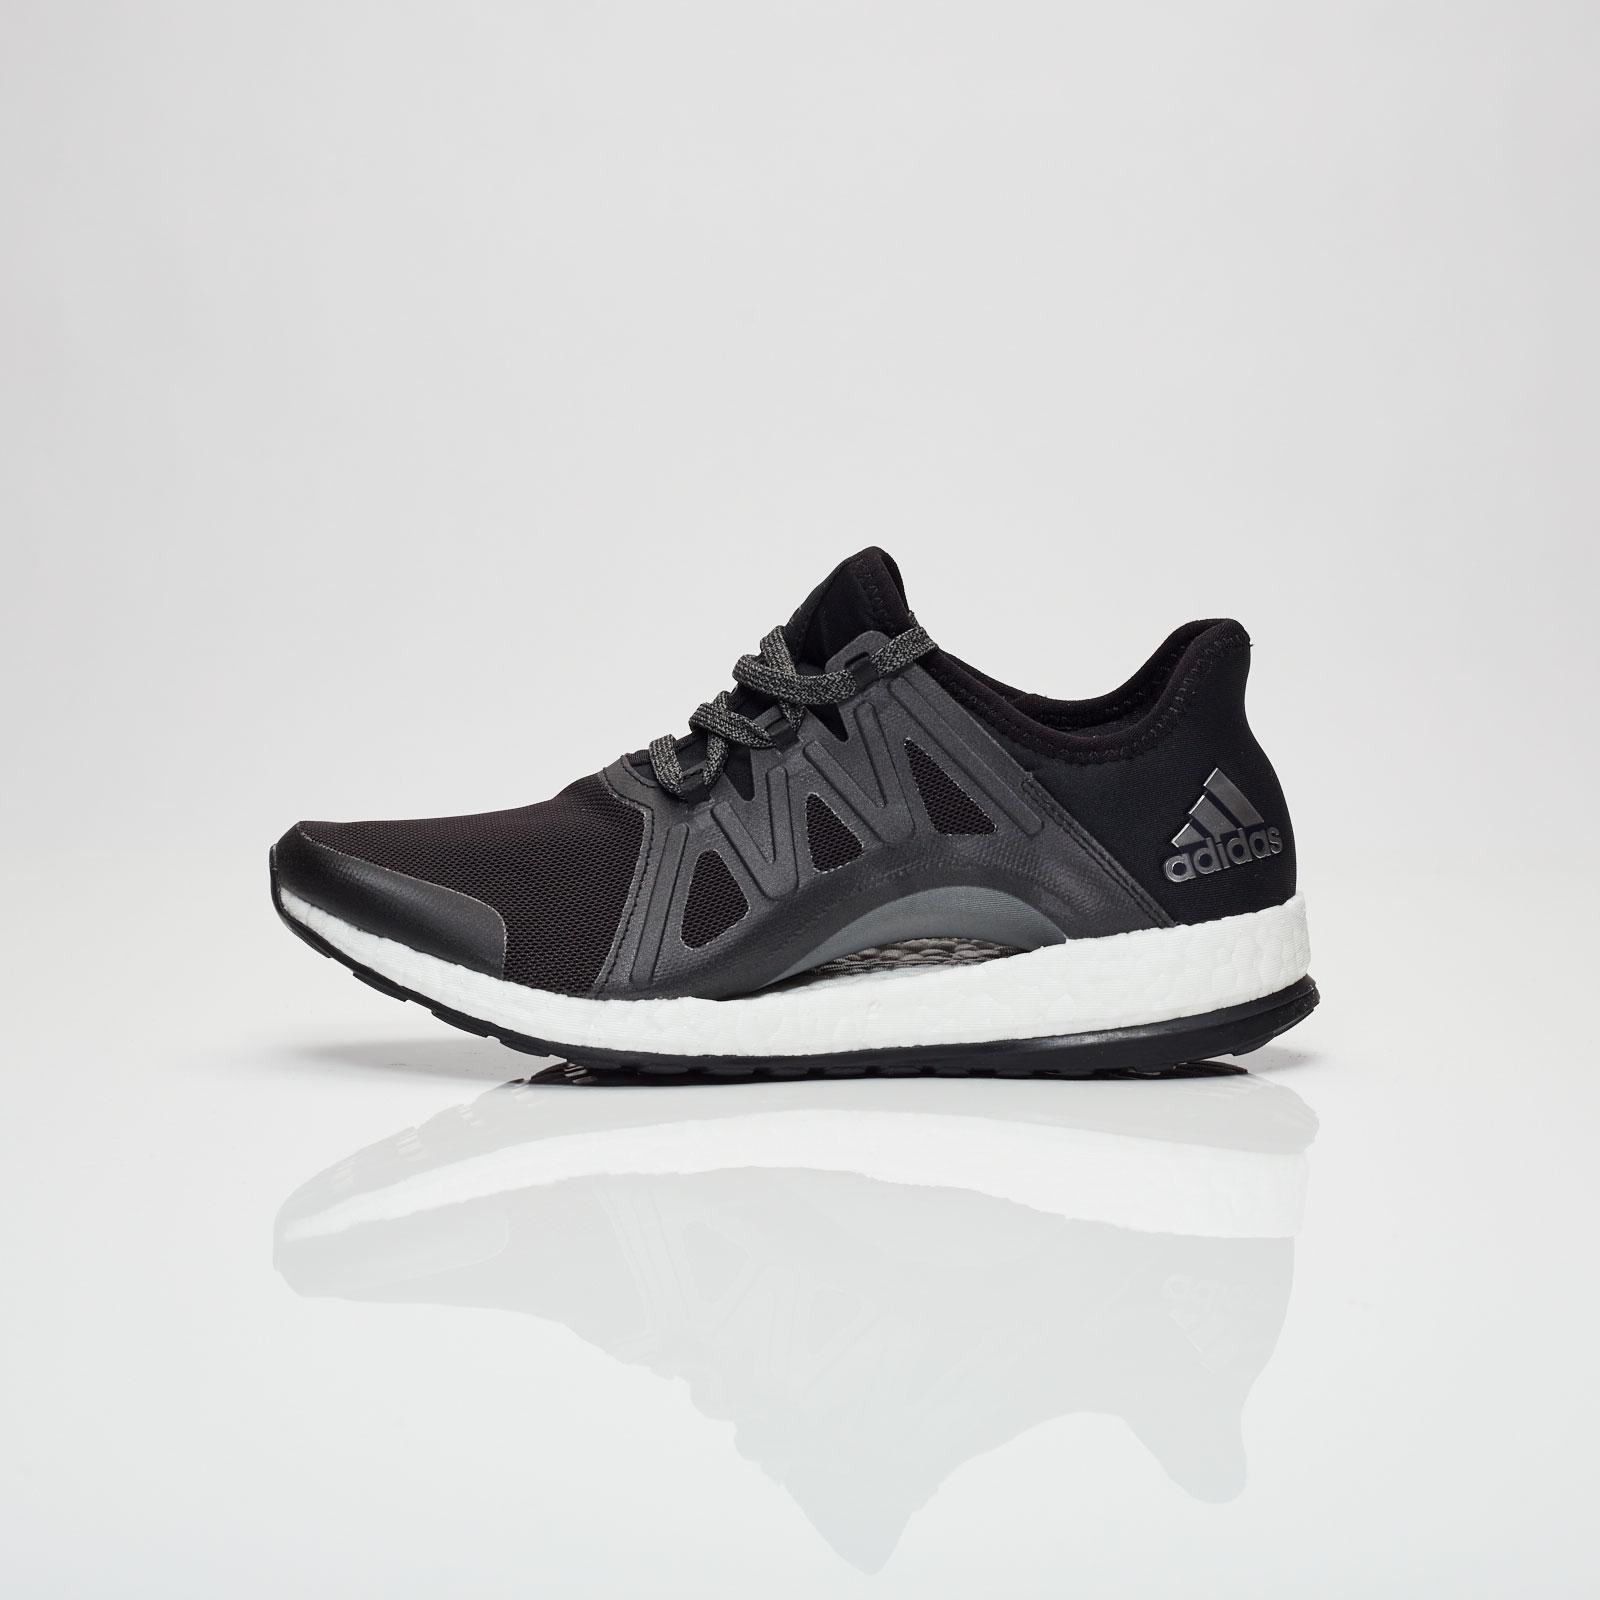 5c659f047350f adidas Wmns Pureboost Xpose - Bb1733 - Sneakersnstuff   sneakers ...